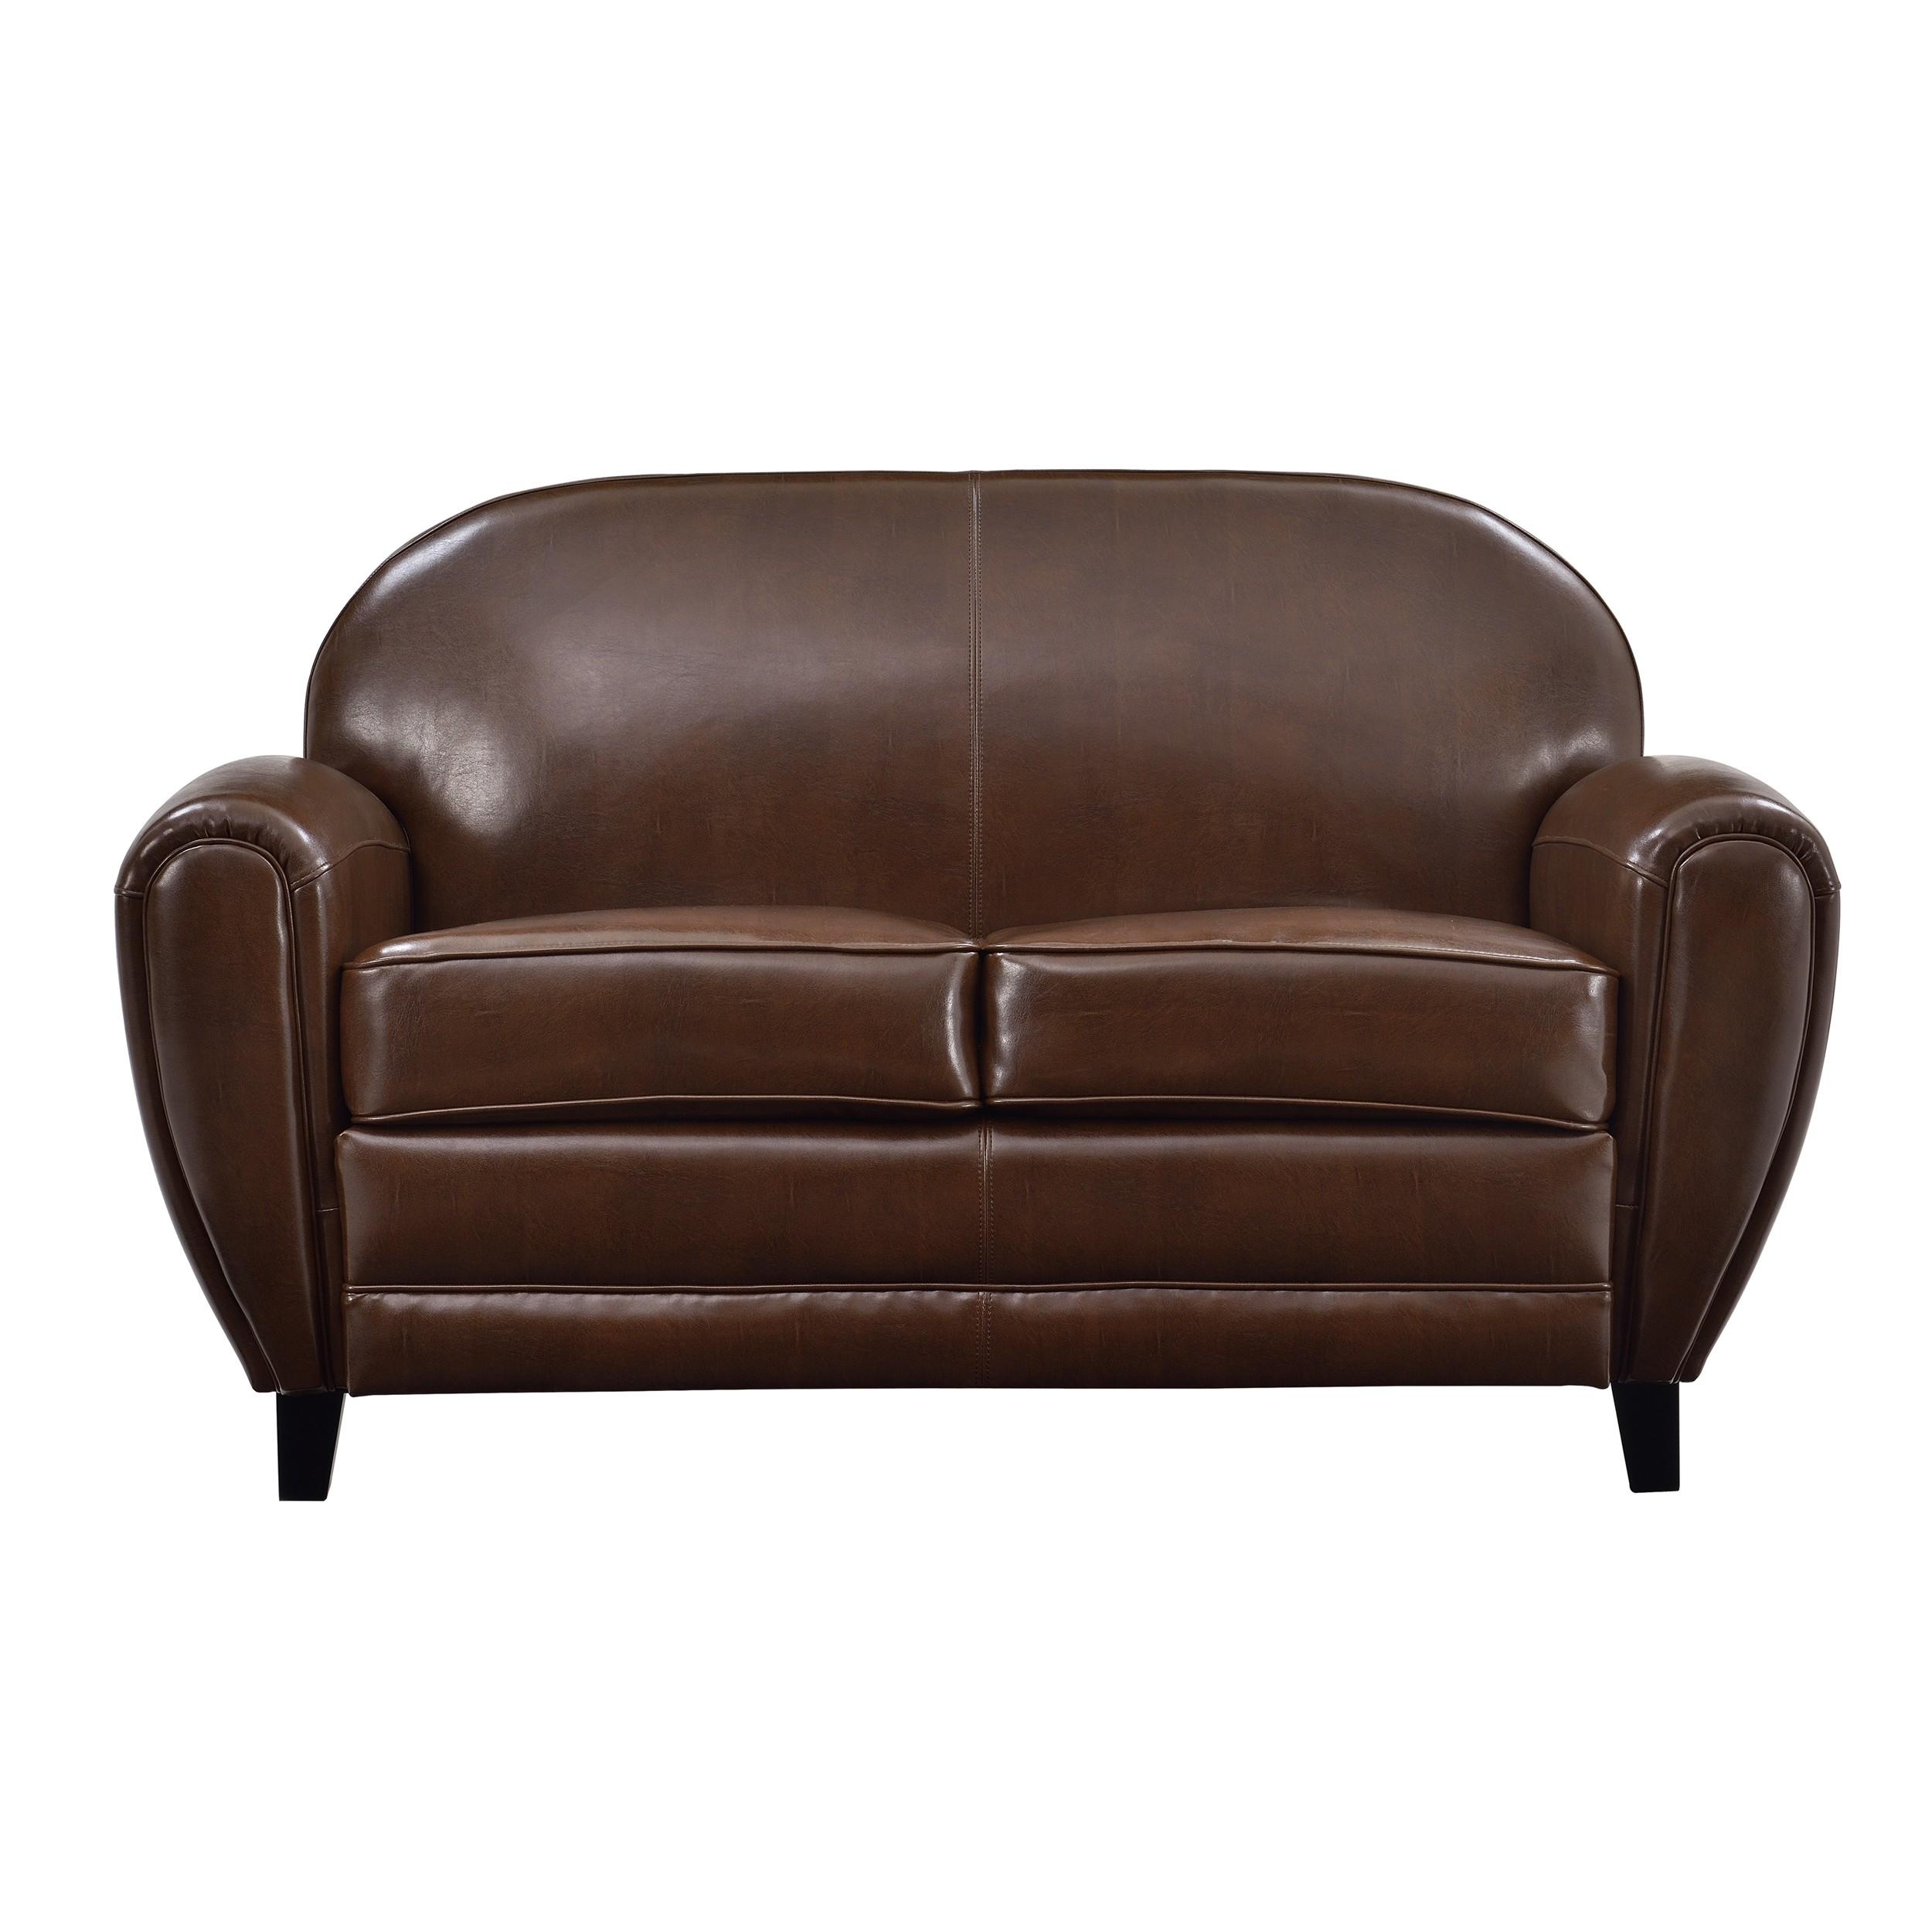 achat canape cuir marron 2 places